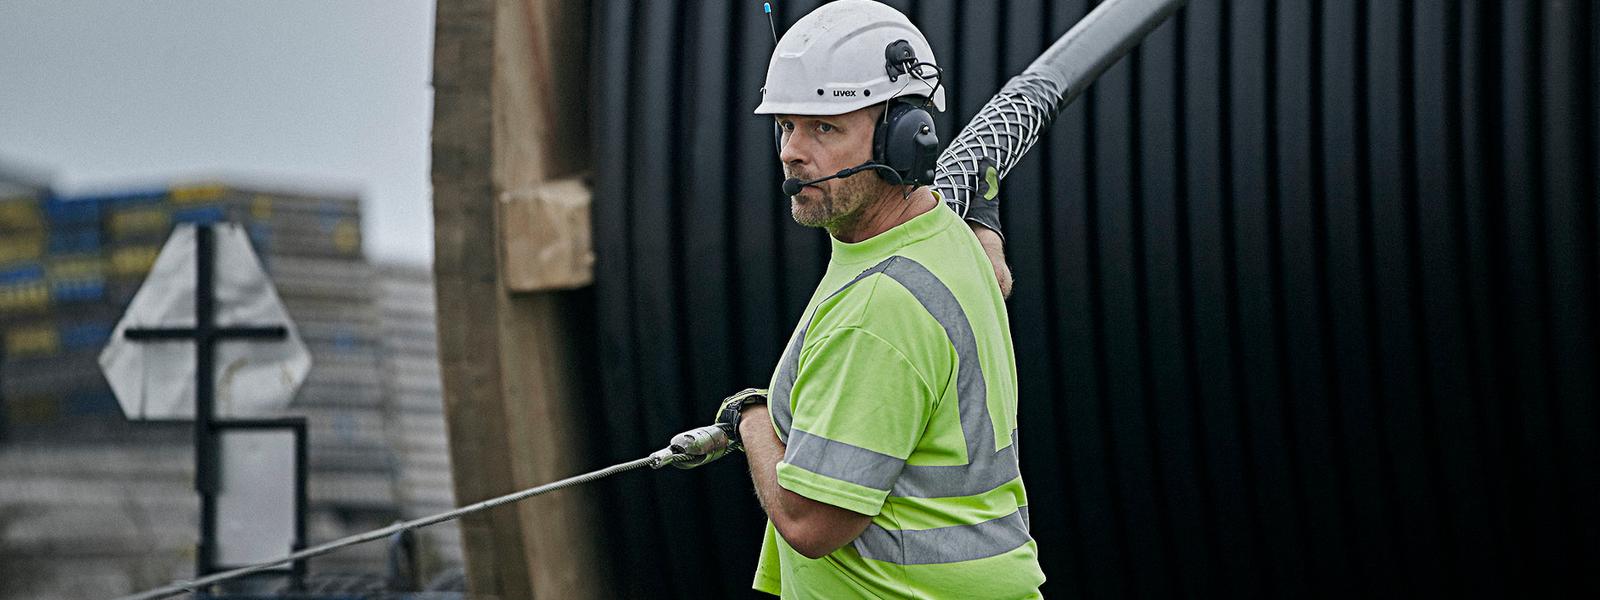 NKT worker installing HV cable